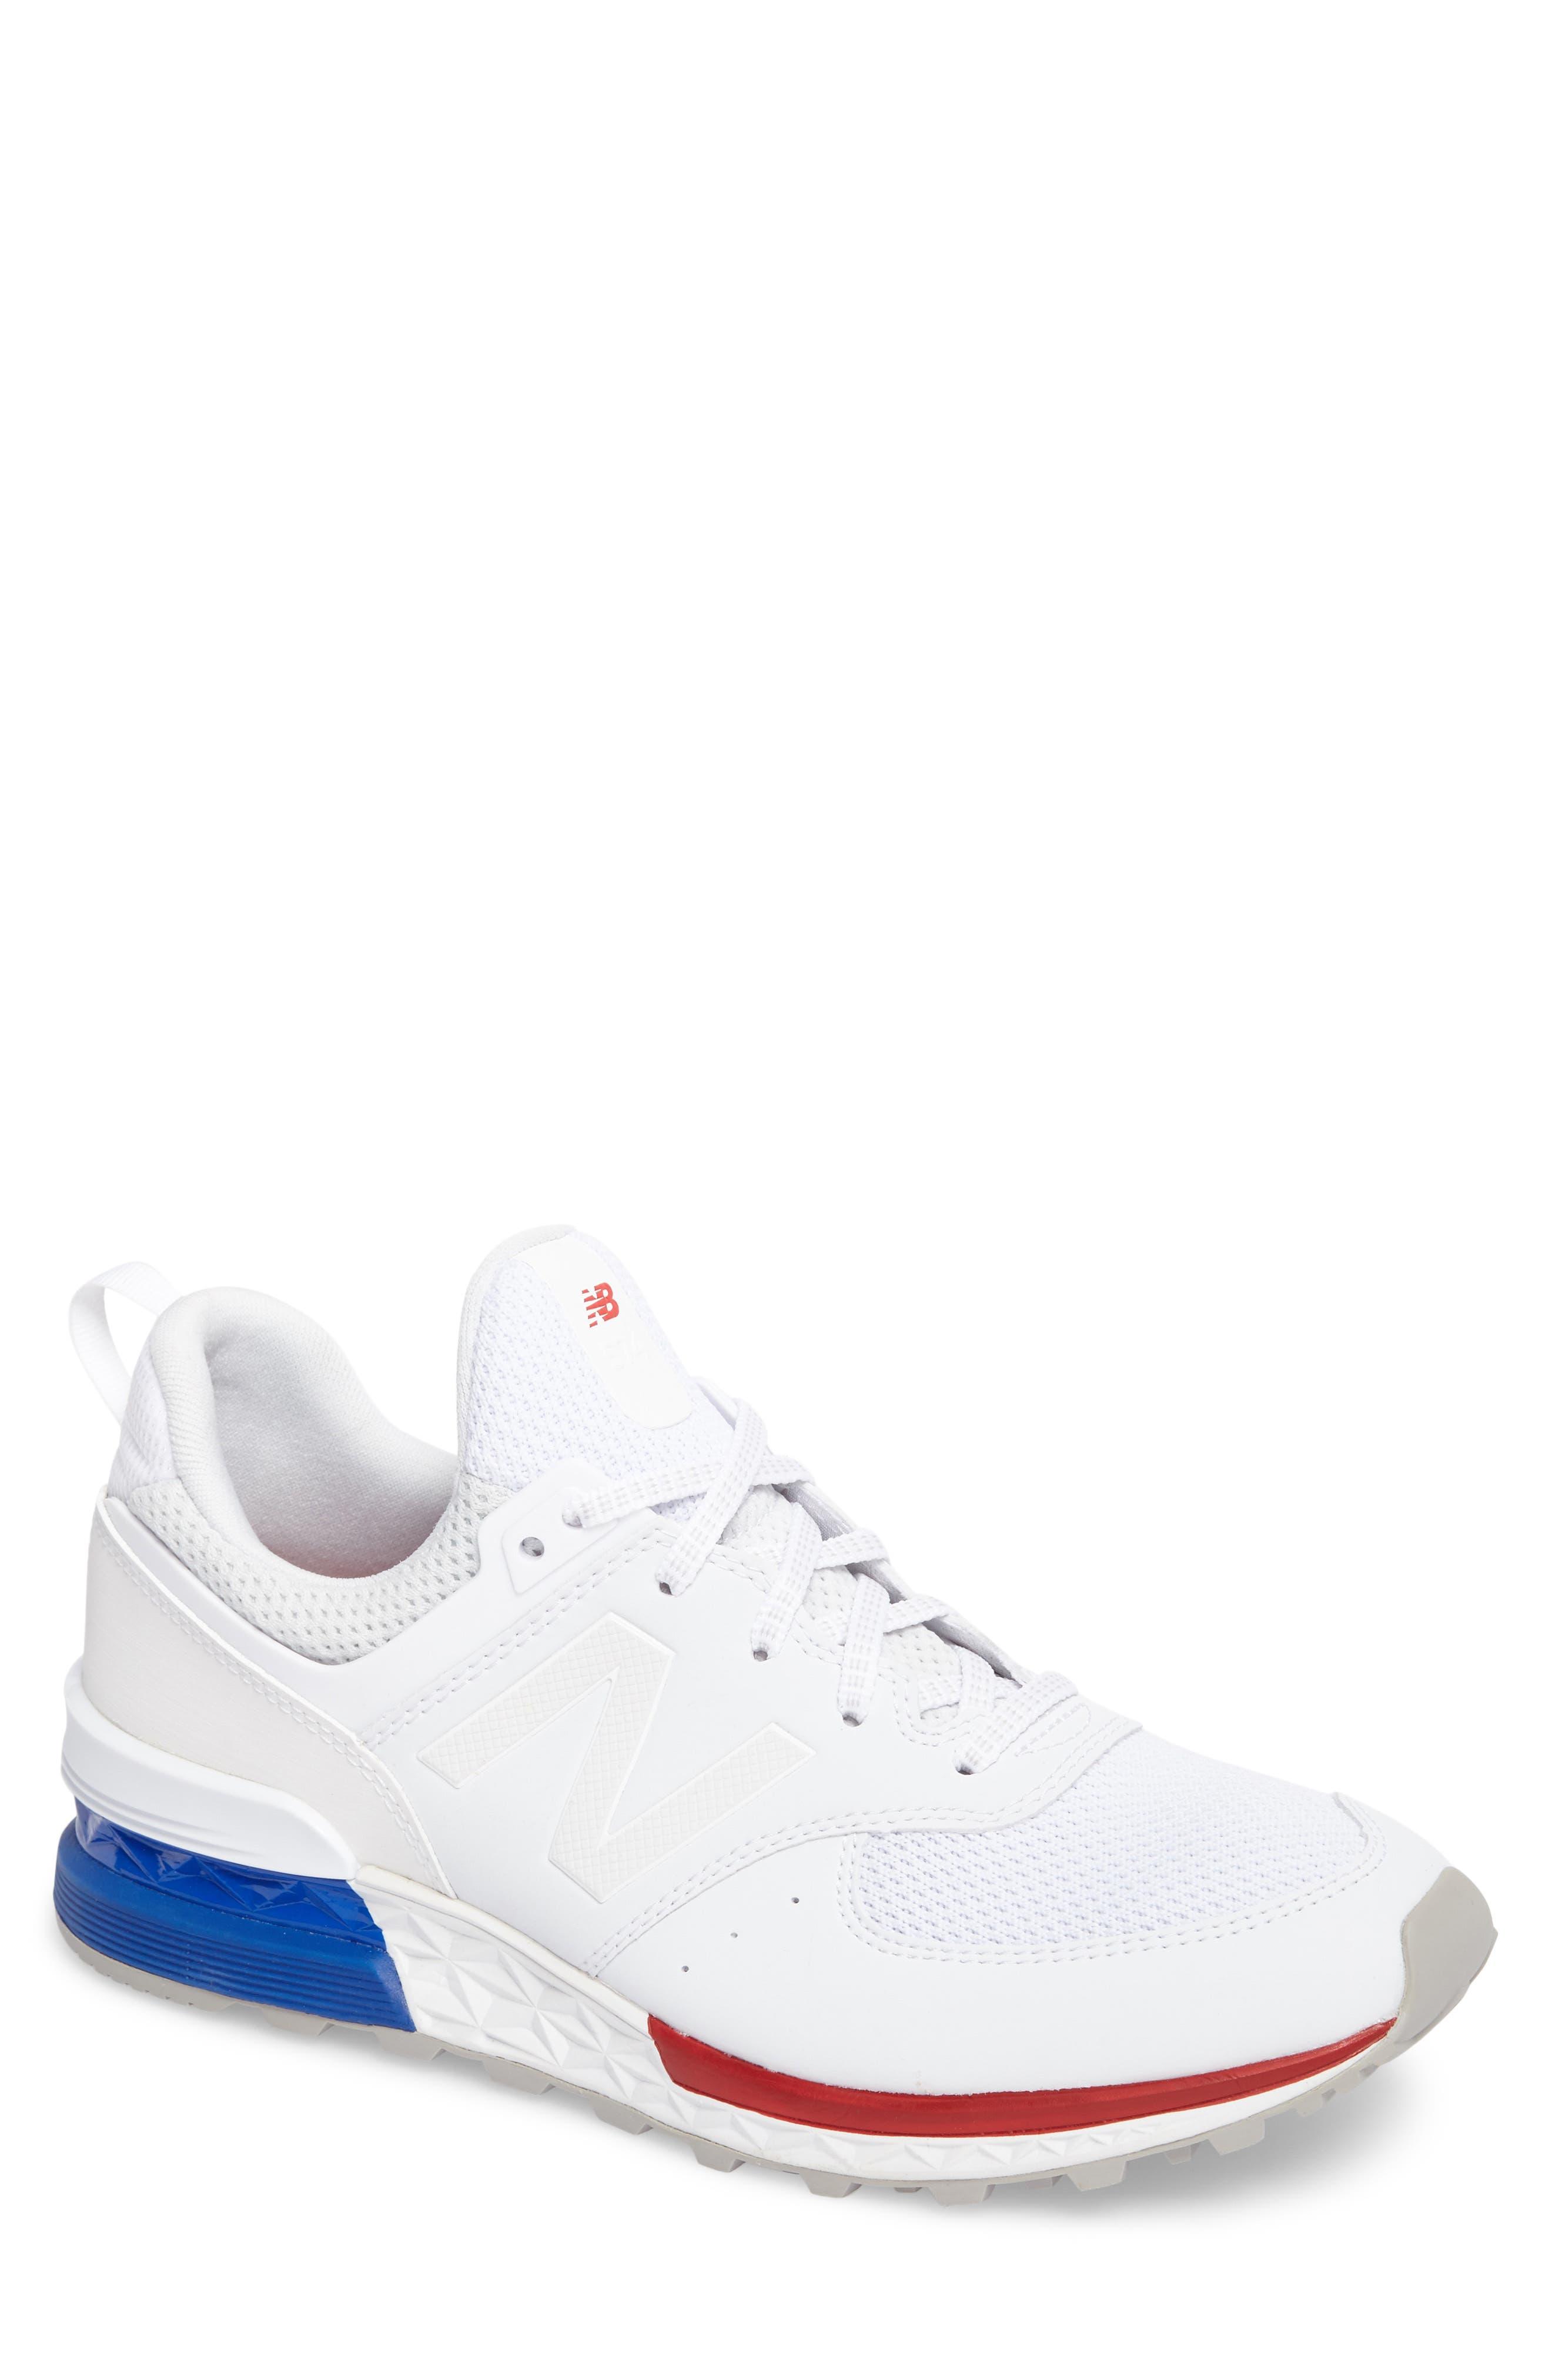 New Balance MS574 Re-Engineered Sneaker (Men)